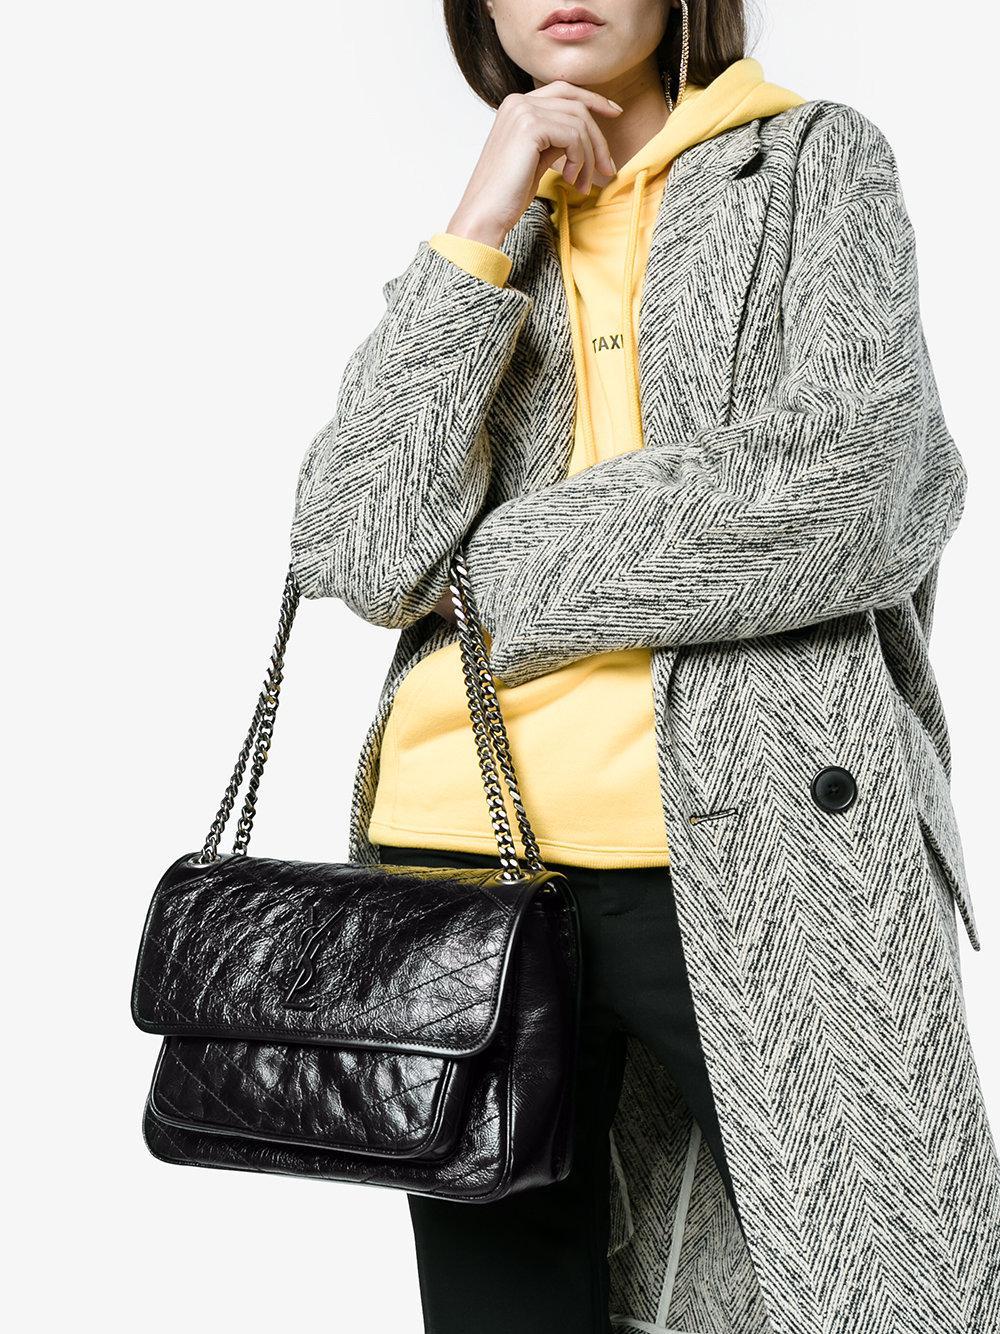 0f64a8a3d31ee Lyst - Saint Laurent Niki Monogram Bag in Black - Save 4%